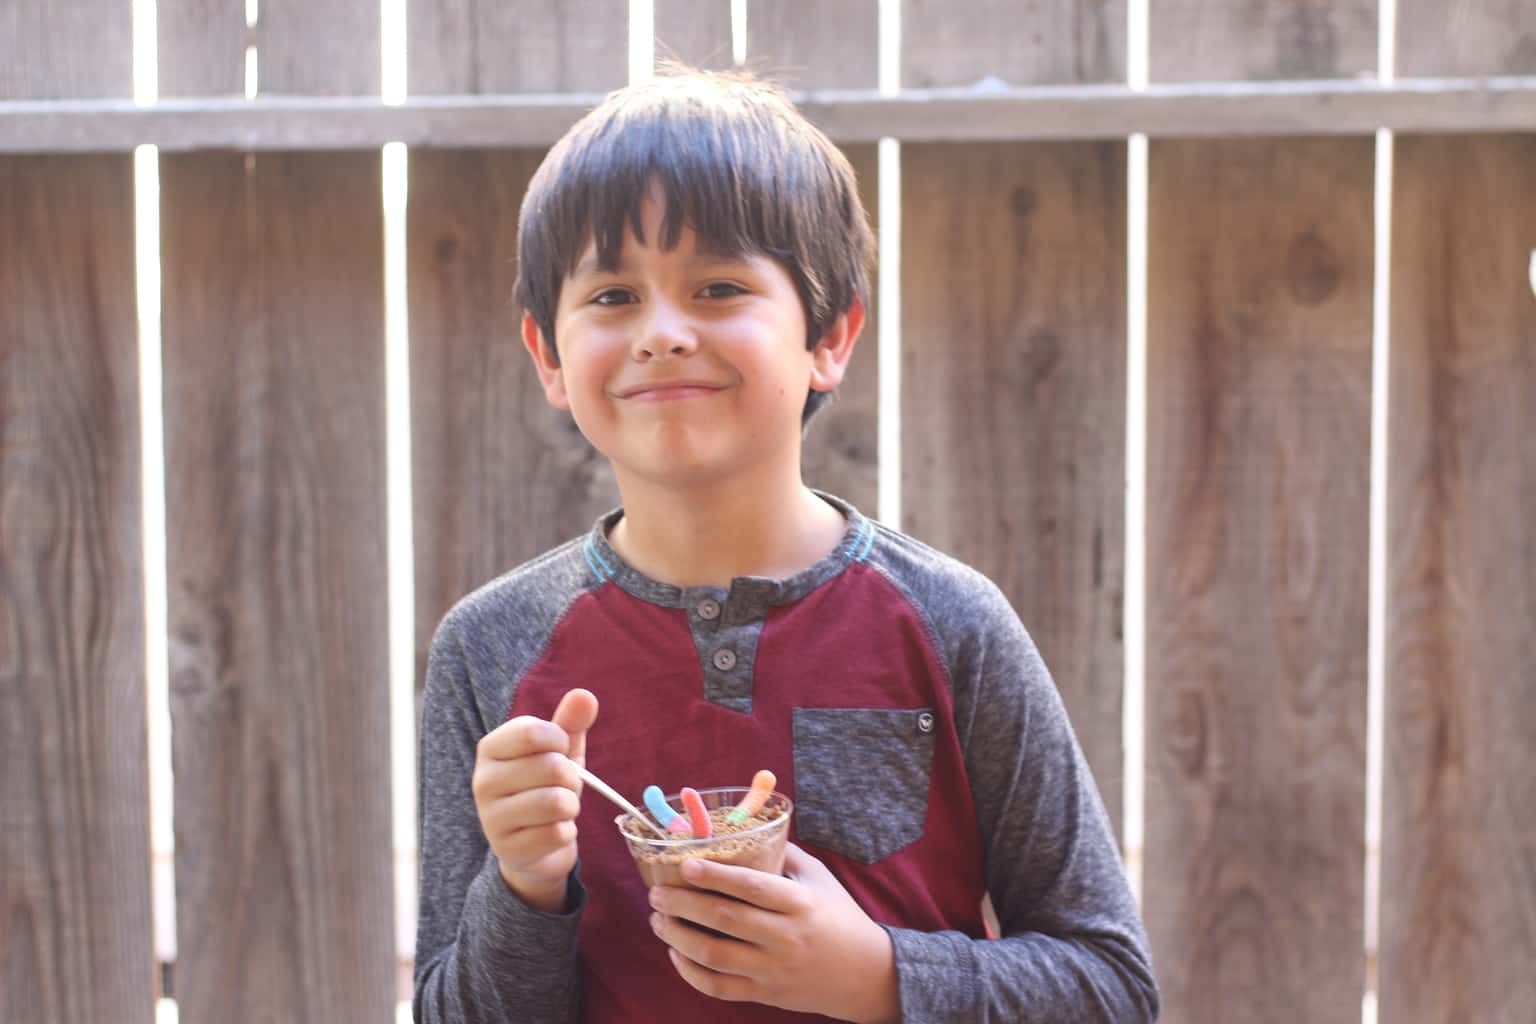 Dia De Los Ninos: Cocoa Puffs Dirt Cups